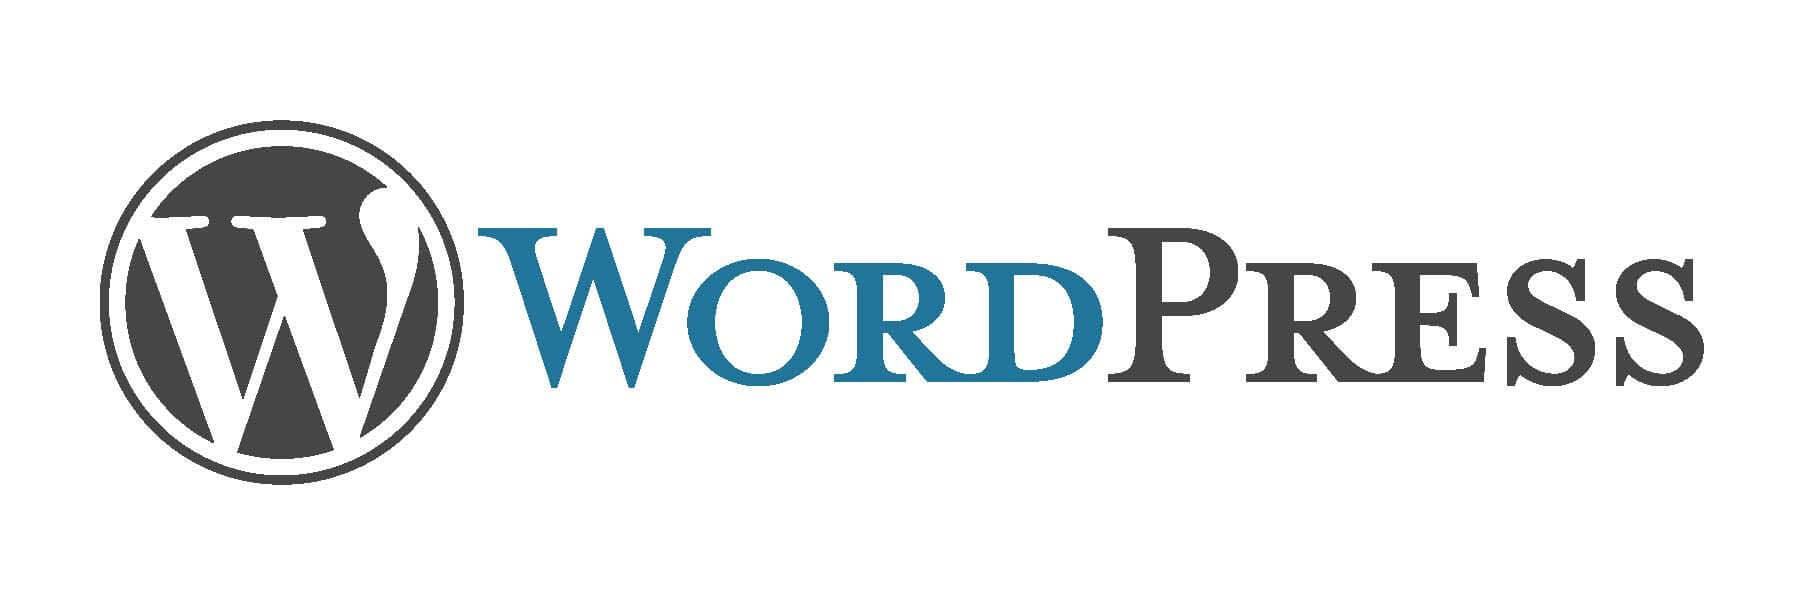 WordPressって知っていますか?